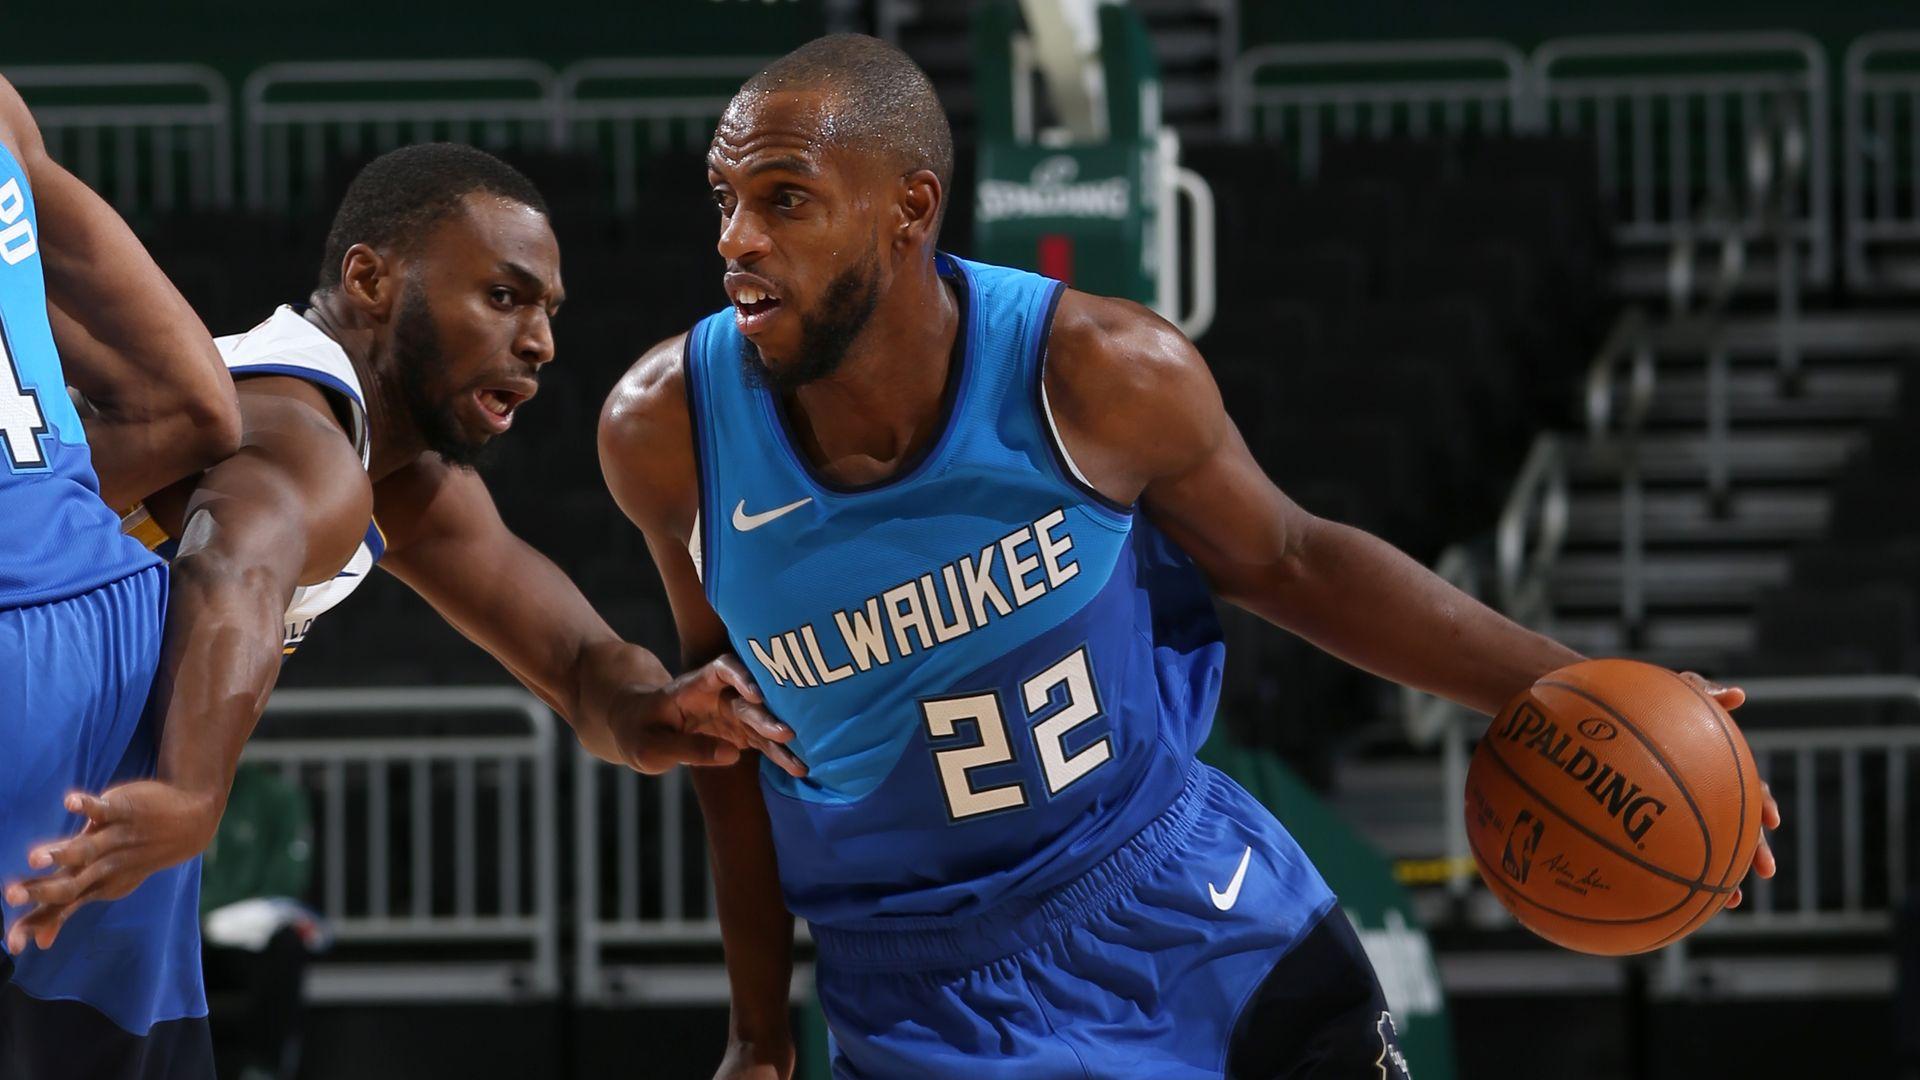 Middleton fires as Bucks blow away Warriors